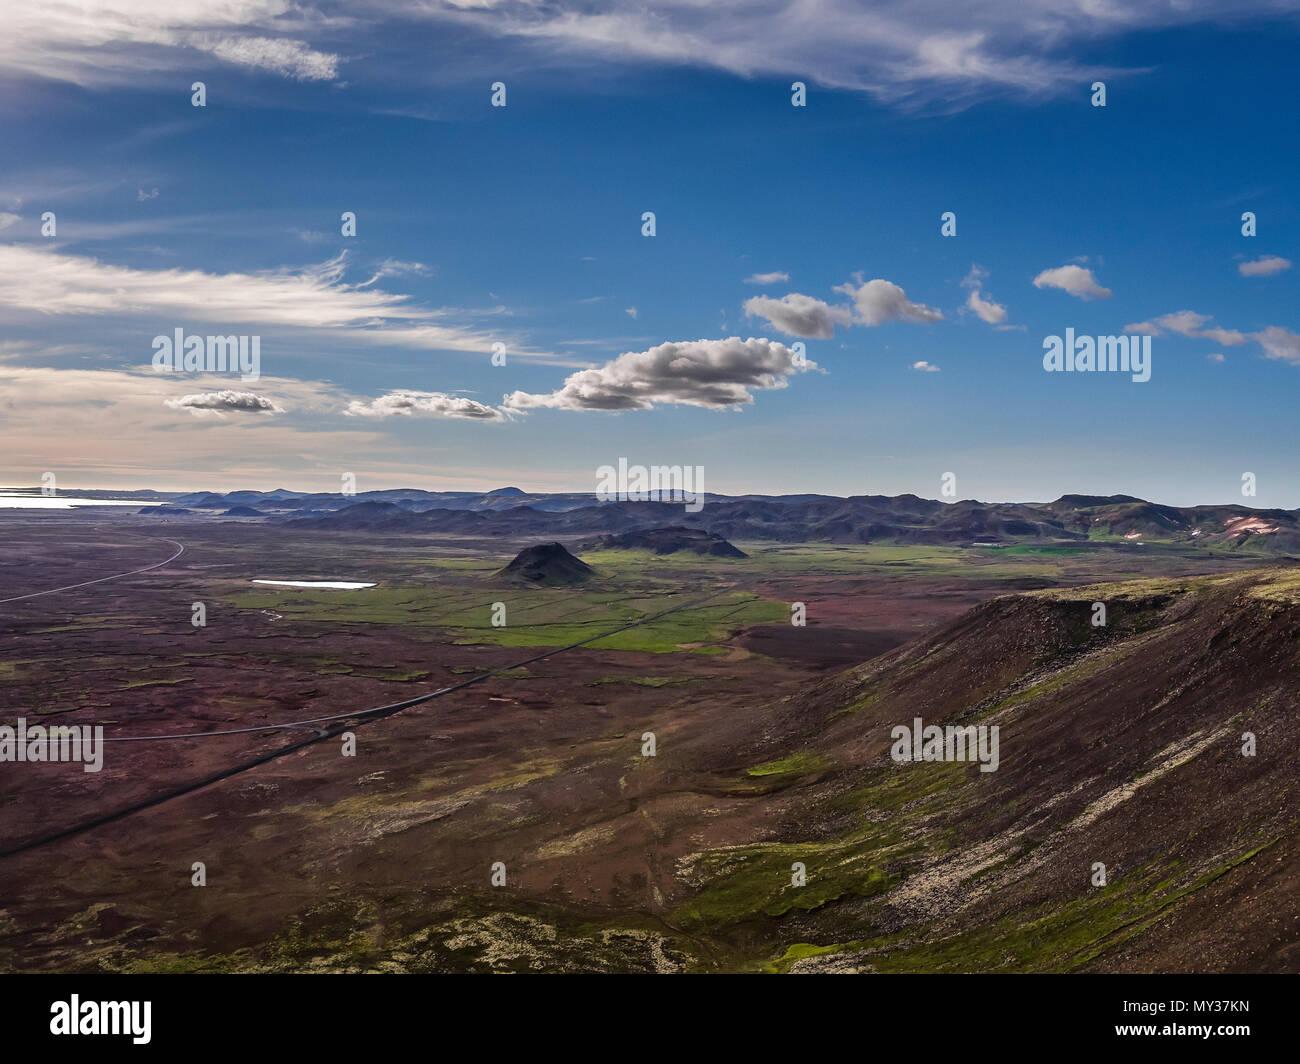 Lava fields, Eldborg, Reykjanes Peninsula, Iceland - Stock Image